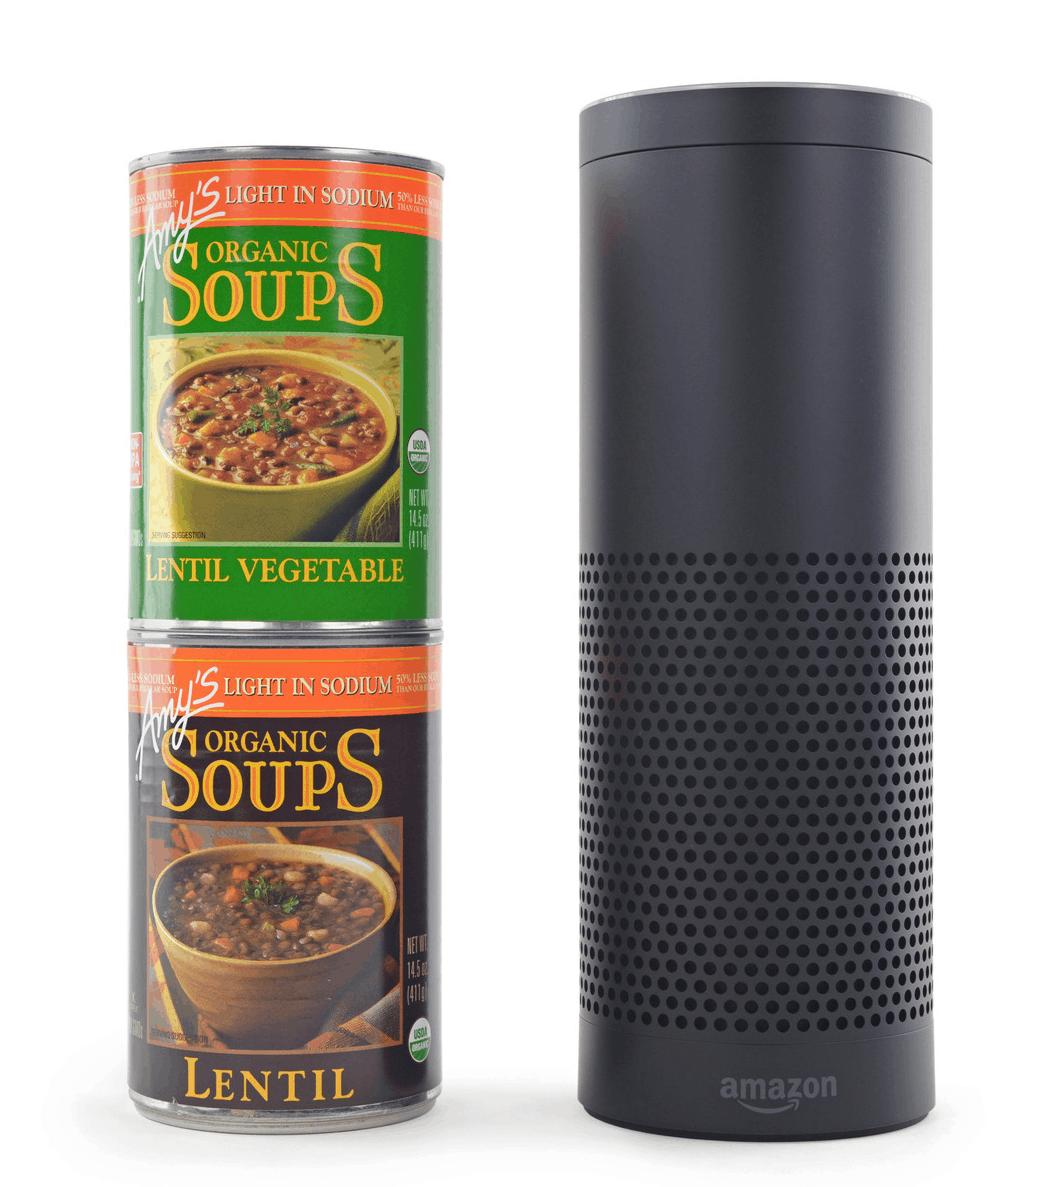 Amazon Echo Teardown Reveals 3 Circuit Boards, 2 Speakers